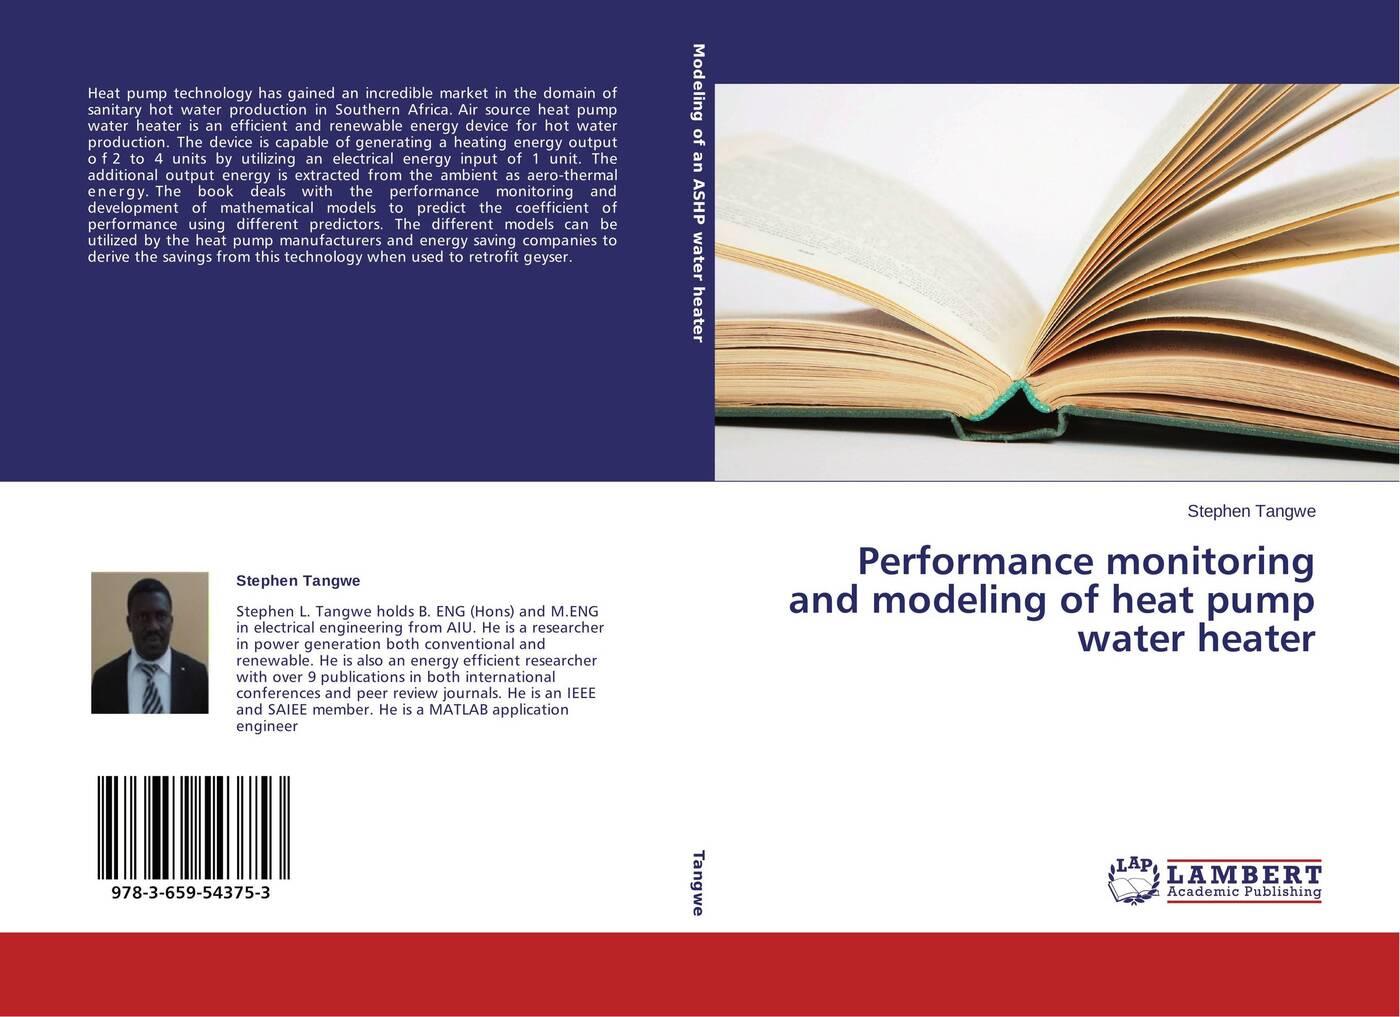 Stephen Tangwe Performance monitoring and modeling of heat pump water heater mujumdar arun s modern drying technology energy savings